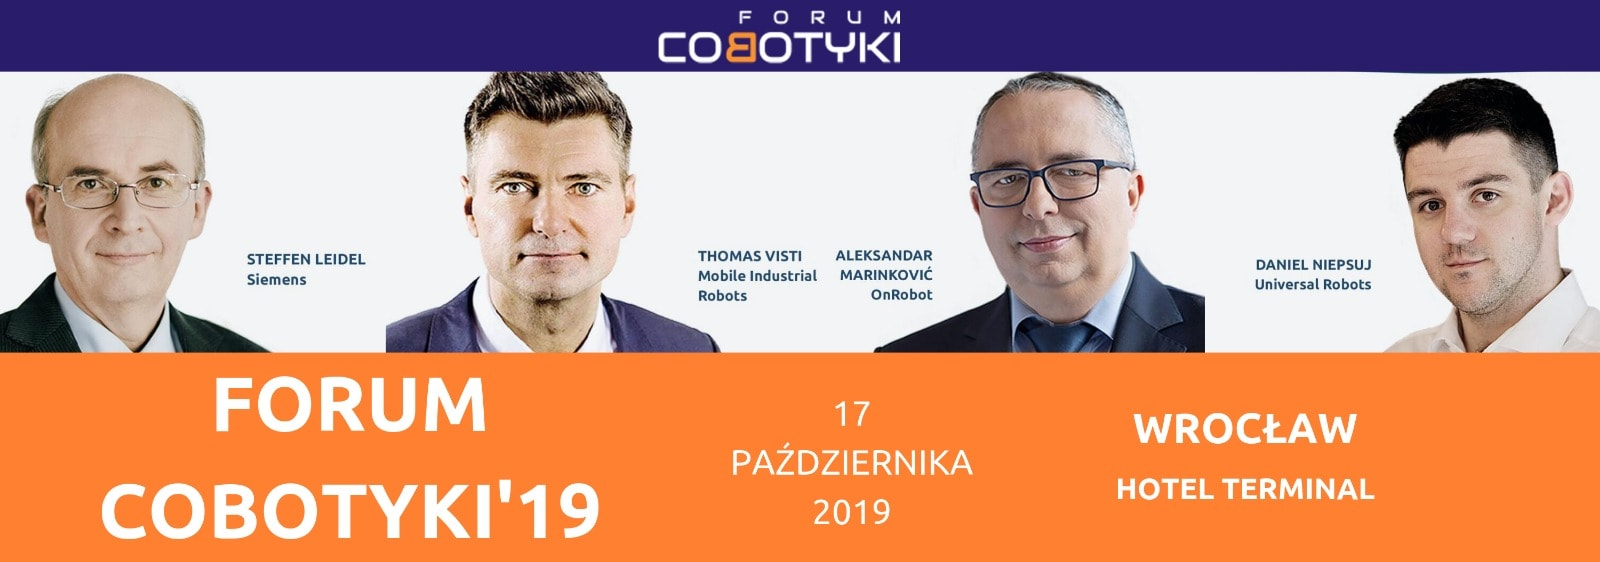 Forum Cobotyki prelegenci